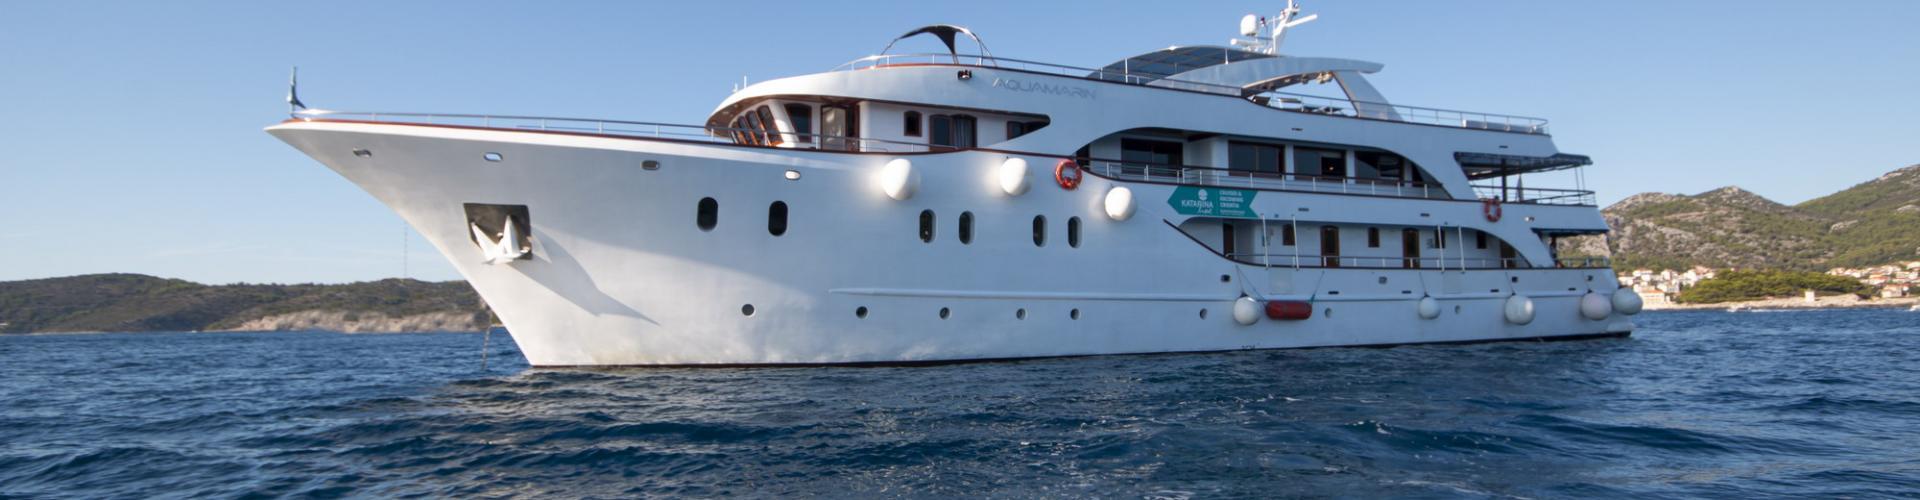 Deluxe cruiser MV Aquamarin- motor yacht